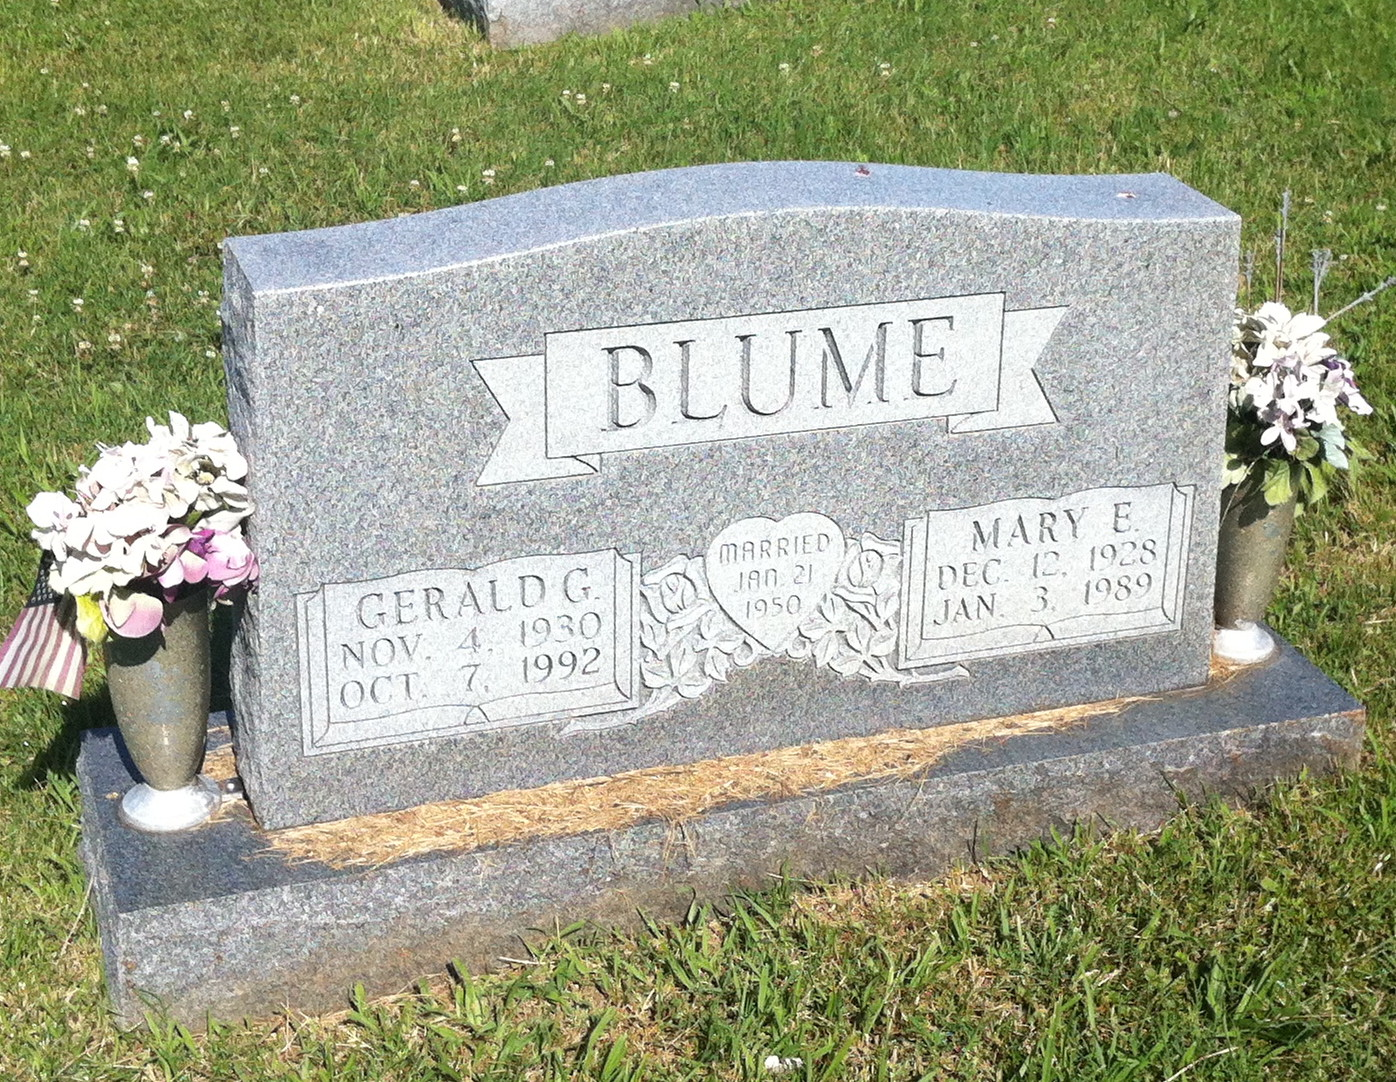 Gerald Blume